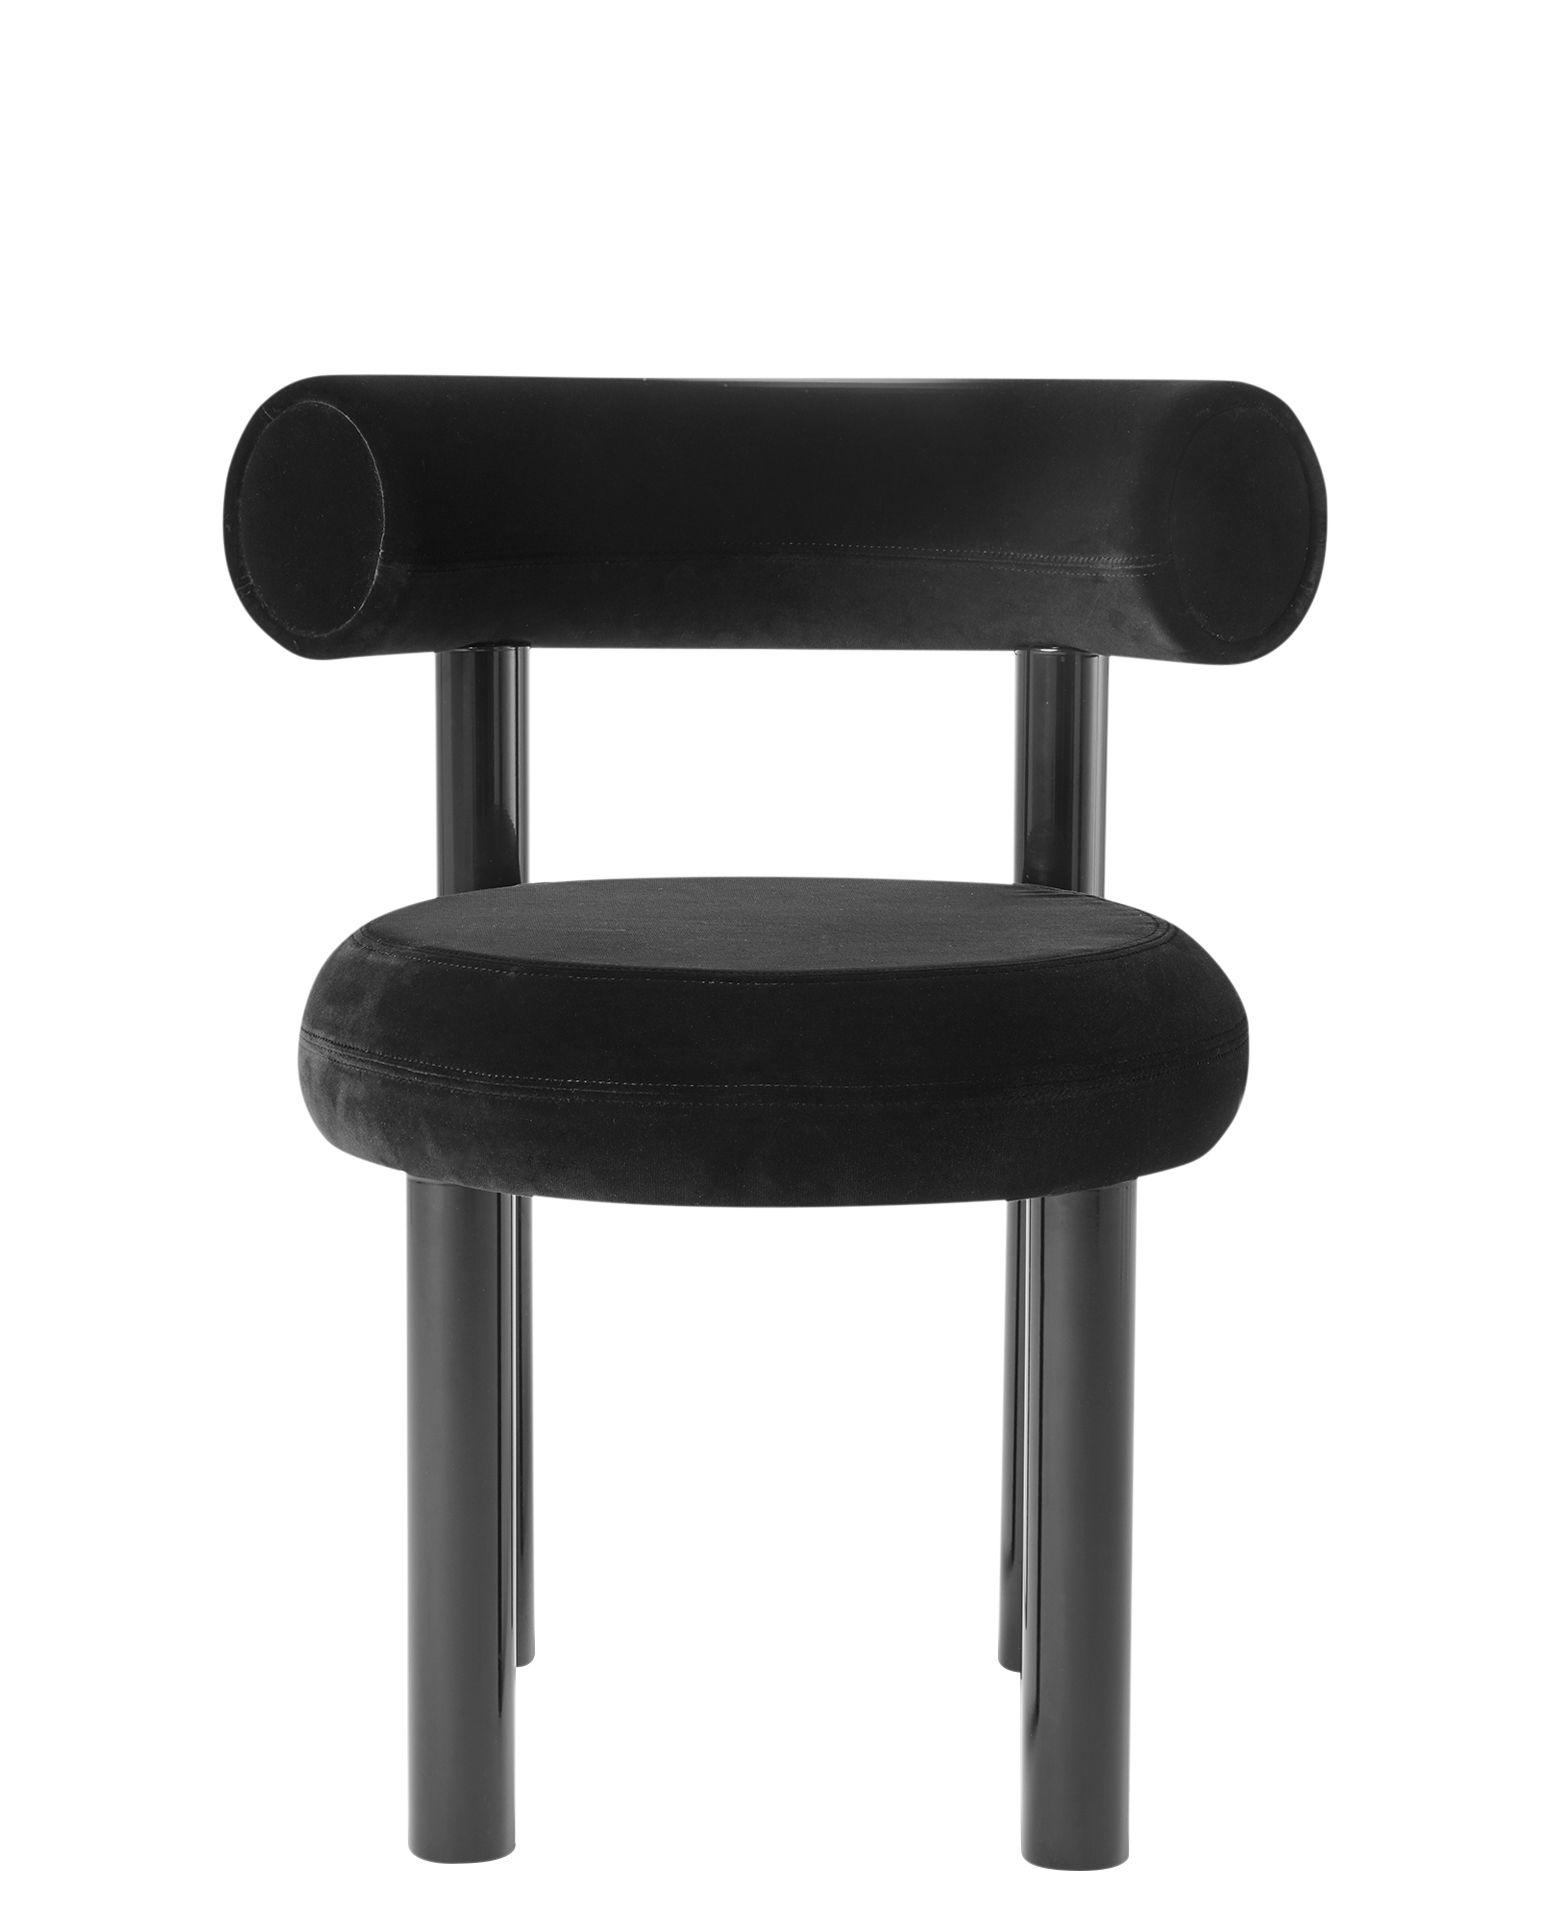 Furniture - Chairs - Fat Padded chair - / Velvet by Tom Dixon - Black - Lacquered steel, Moulded foam, Velvet